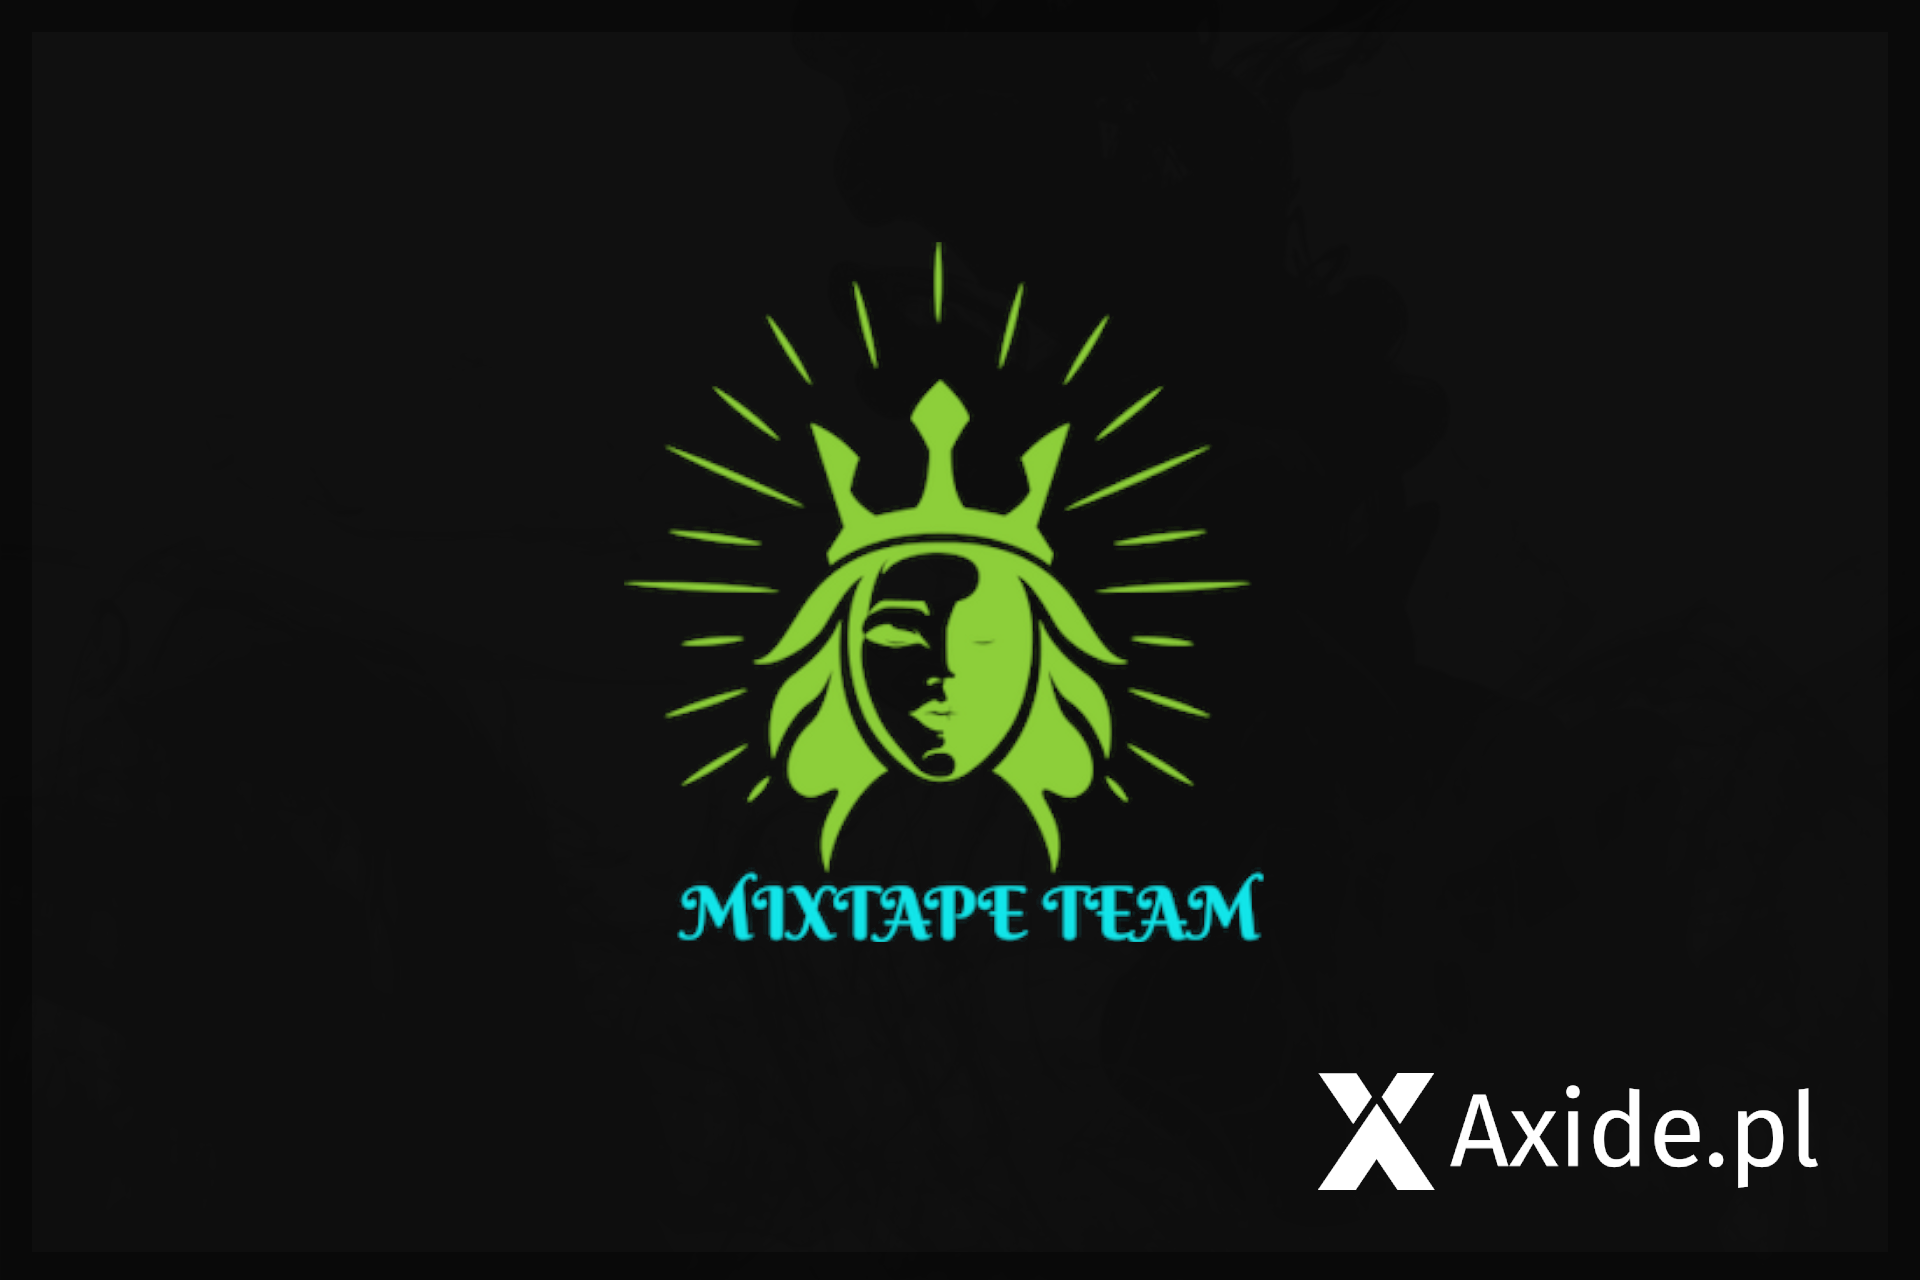 mixtape team